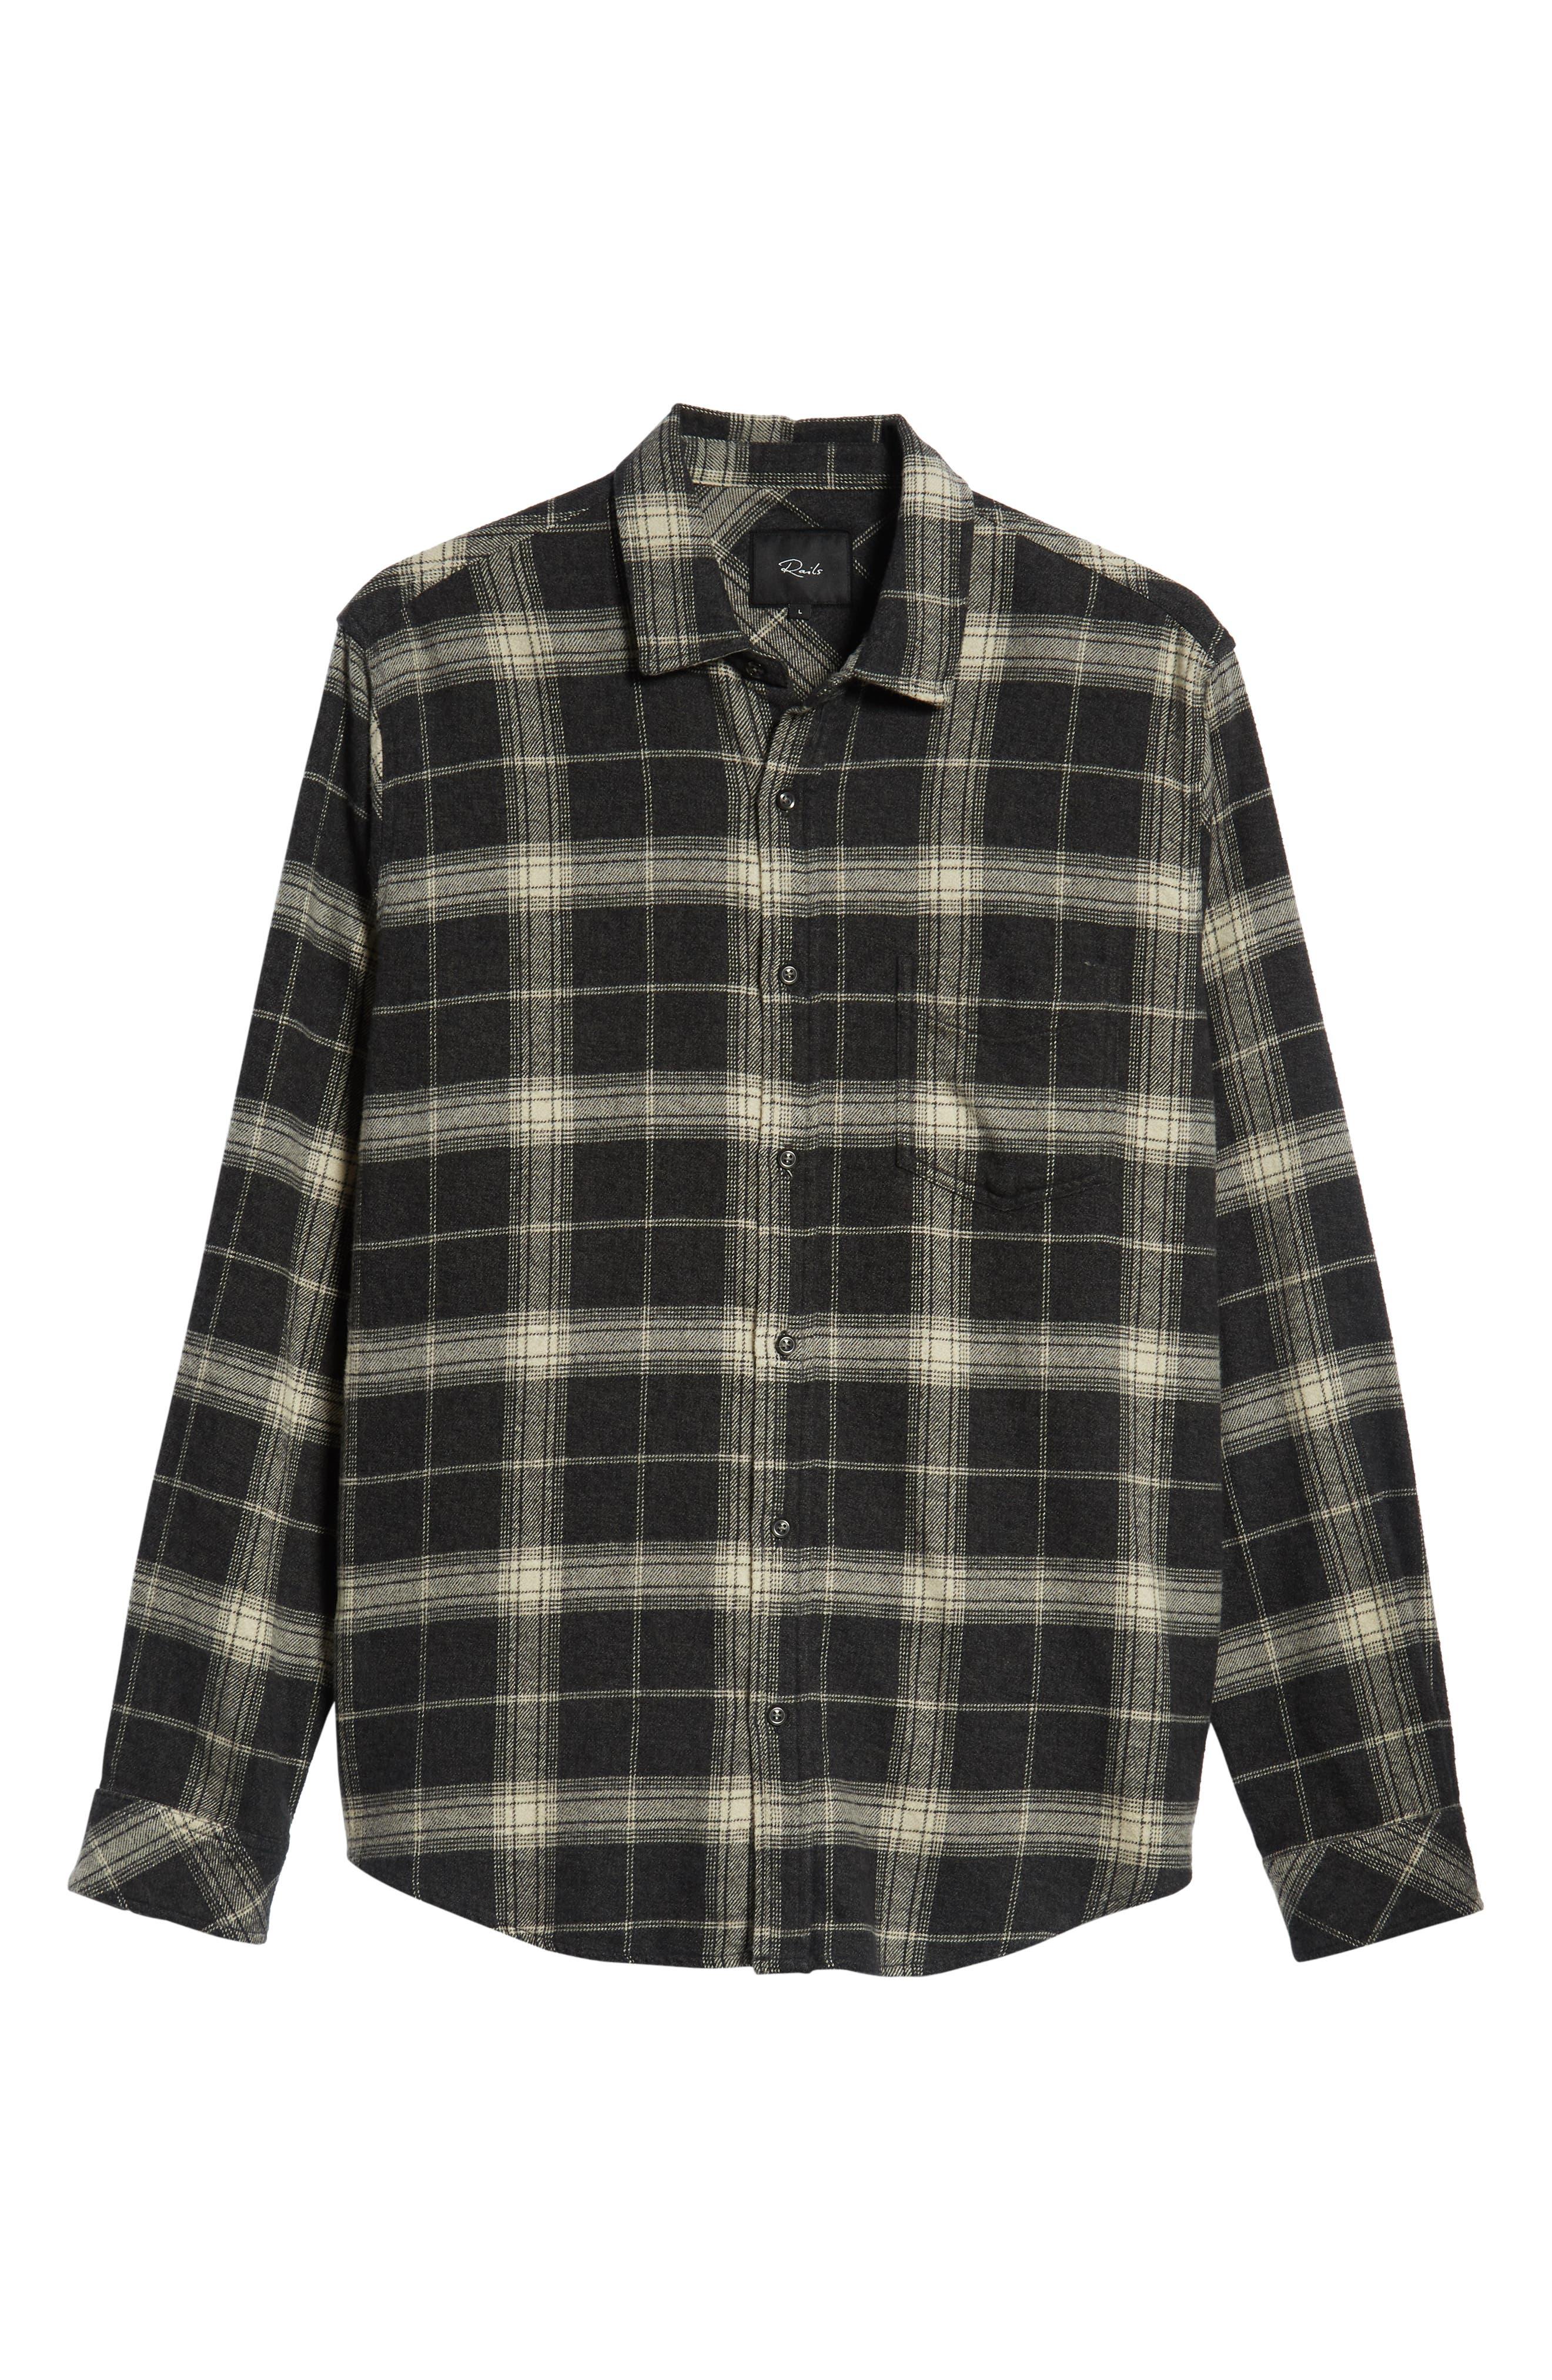 Forrest Regular Fit Plaid Flannel Sport Shirt,                             Alternate thumbnail 5, color,                             COAL/ IVORY